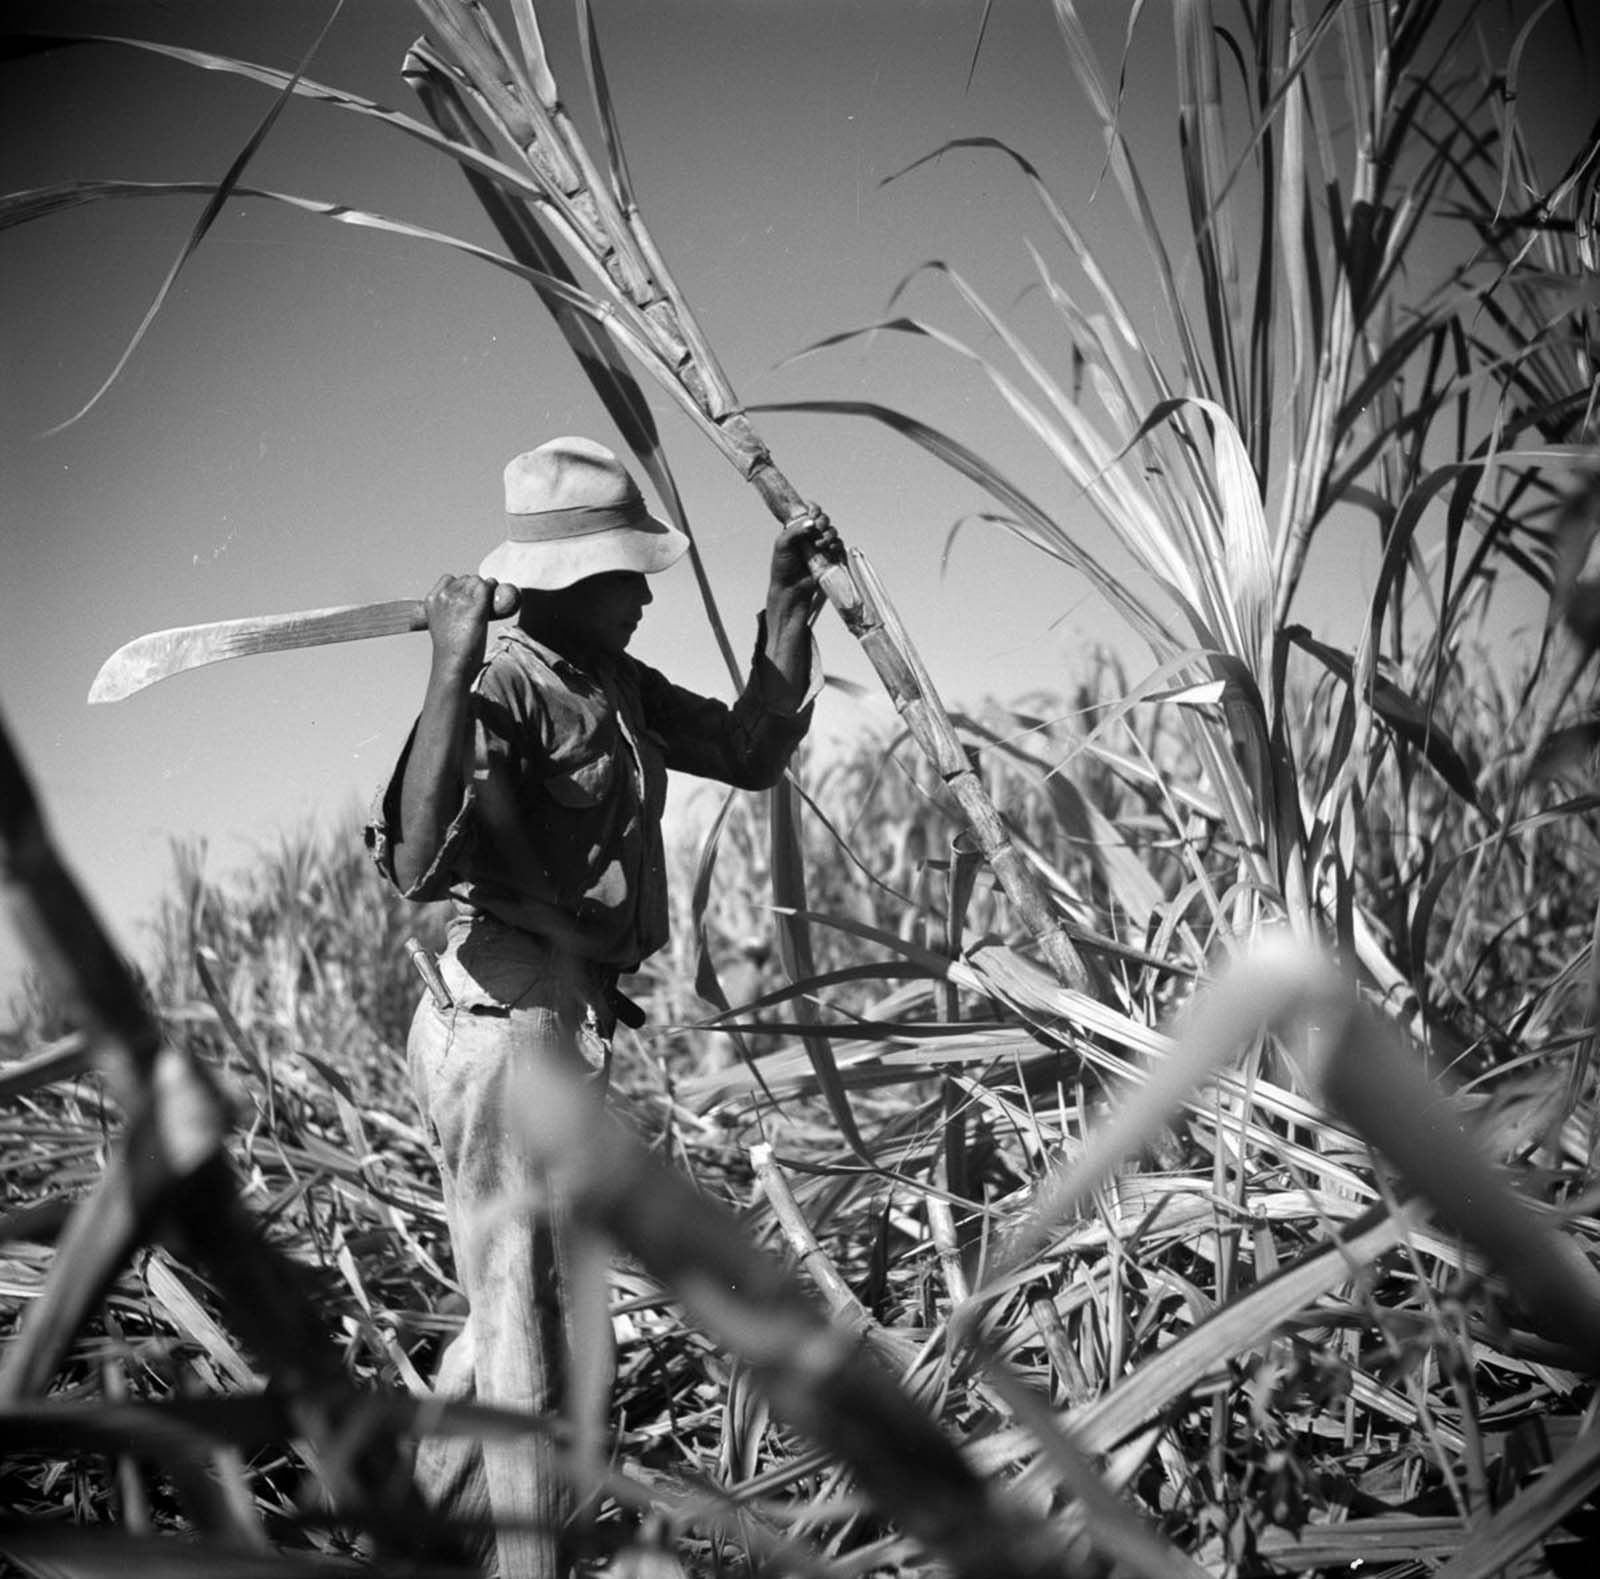 A worker cuts sugarcane on a plantation.